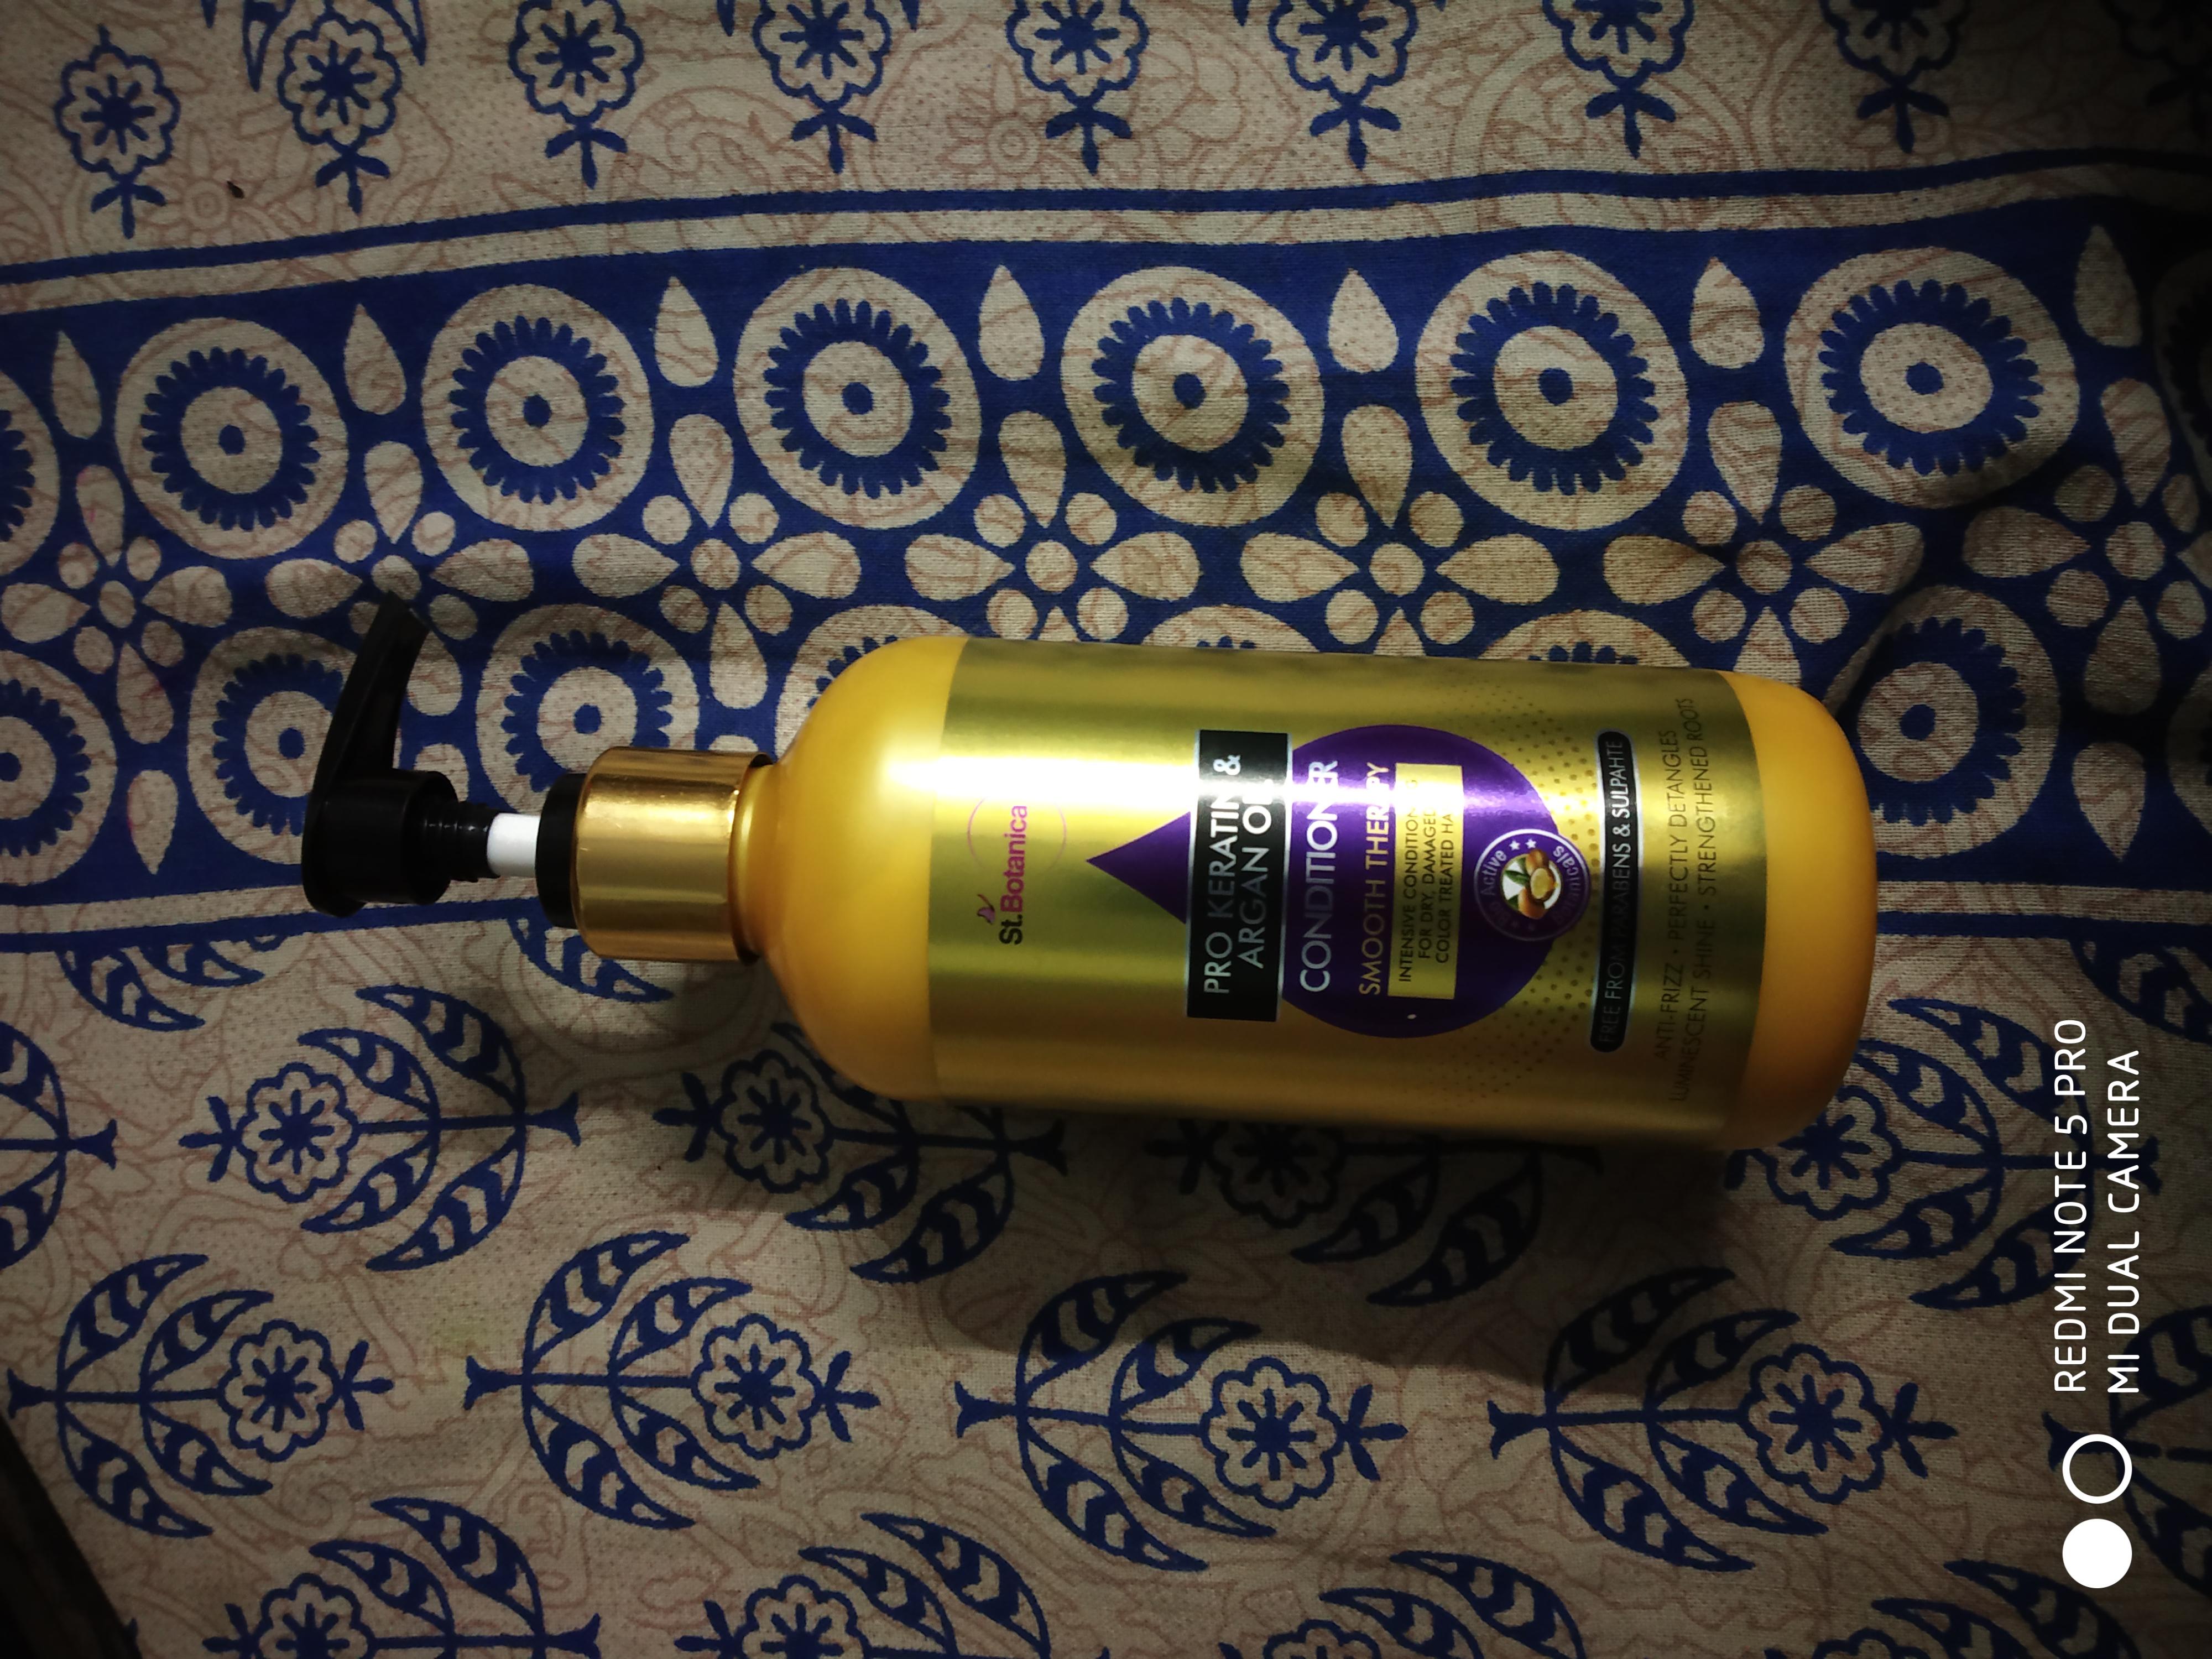 StBotanica Pro Keratin & Argan Oil Conditioner-Amazing product dry hair-By priyadarshini_08